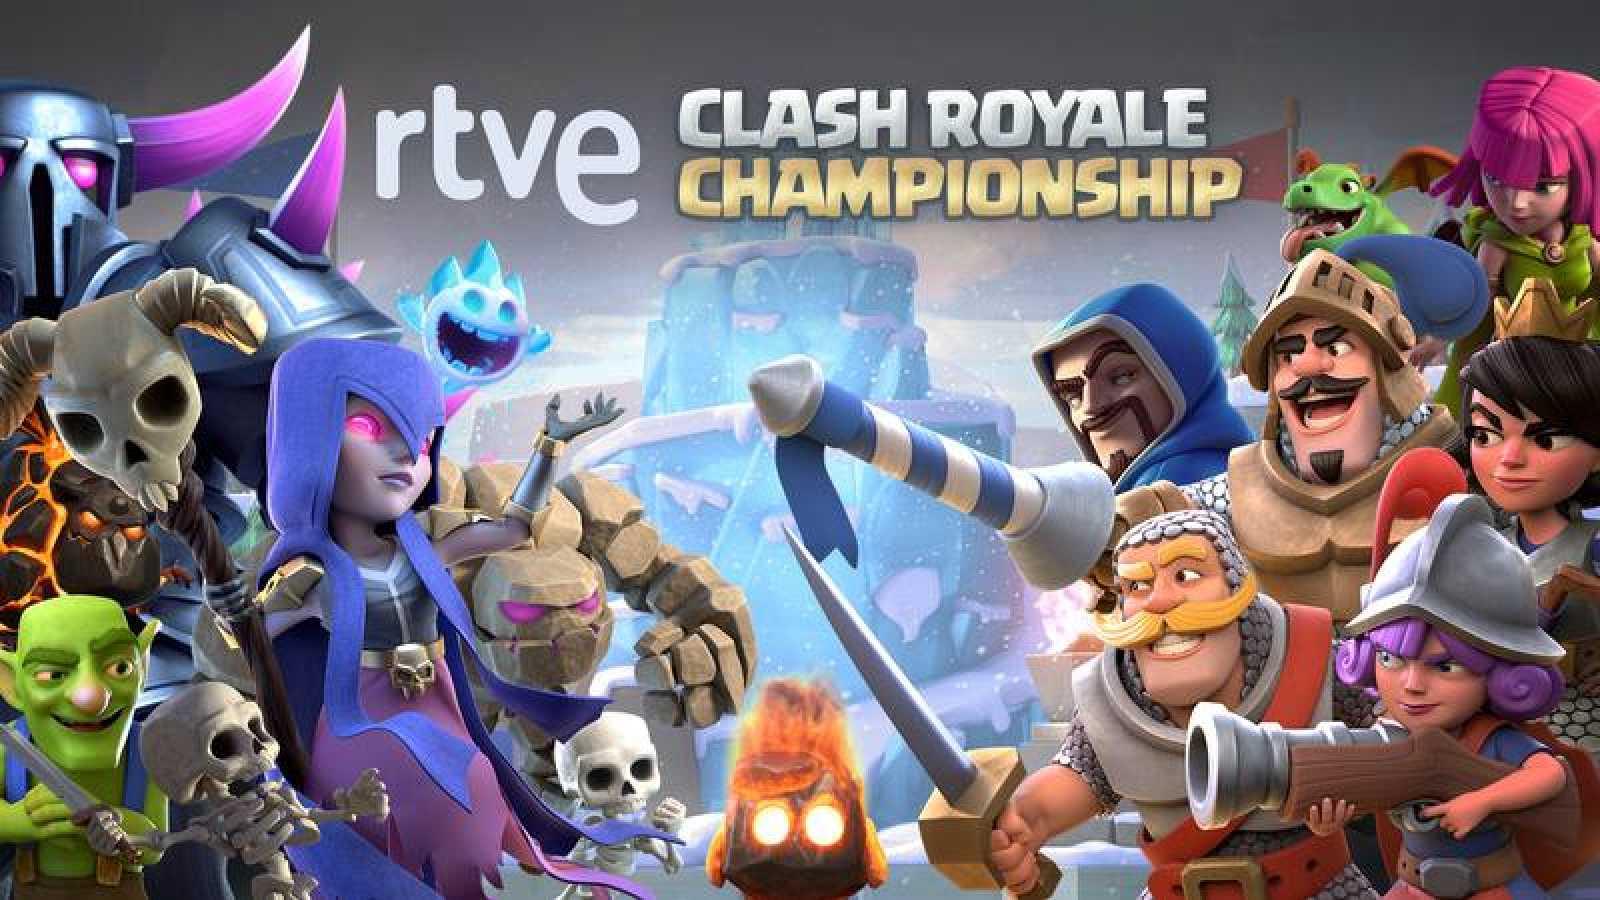 La RTVE Clash Royale Championship comienza este miércoles con su primer clasificatorio